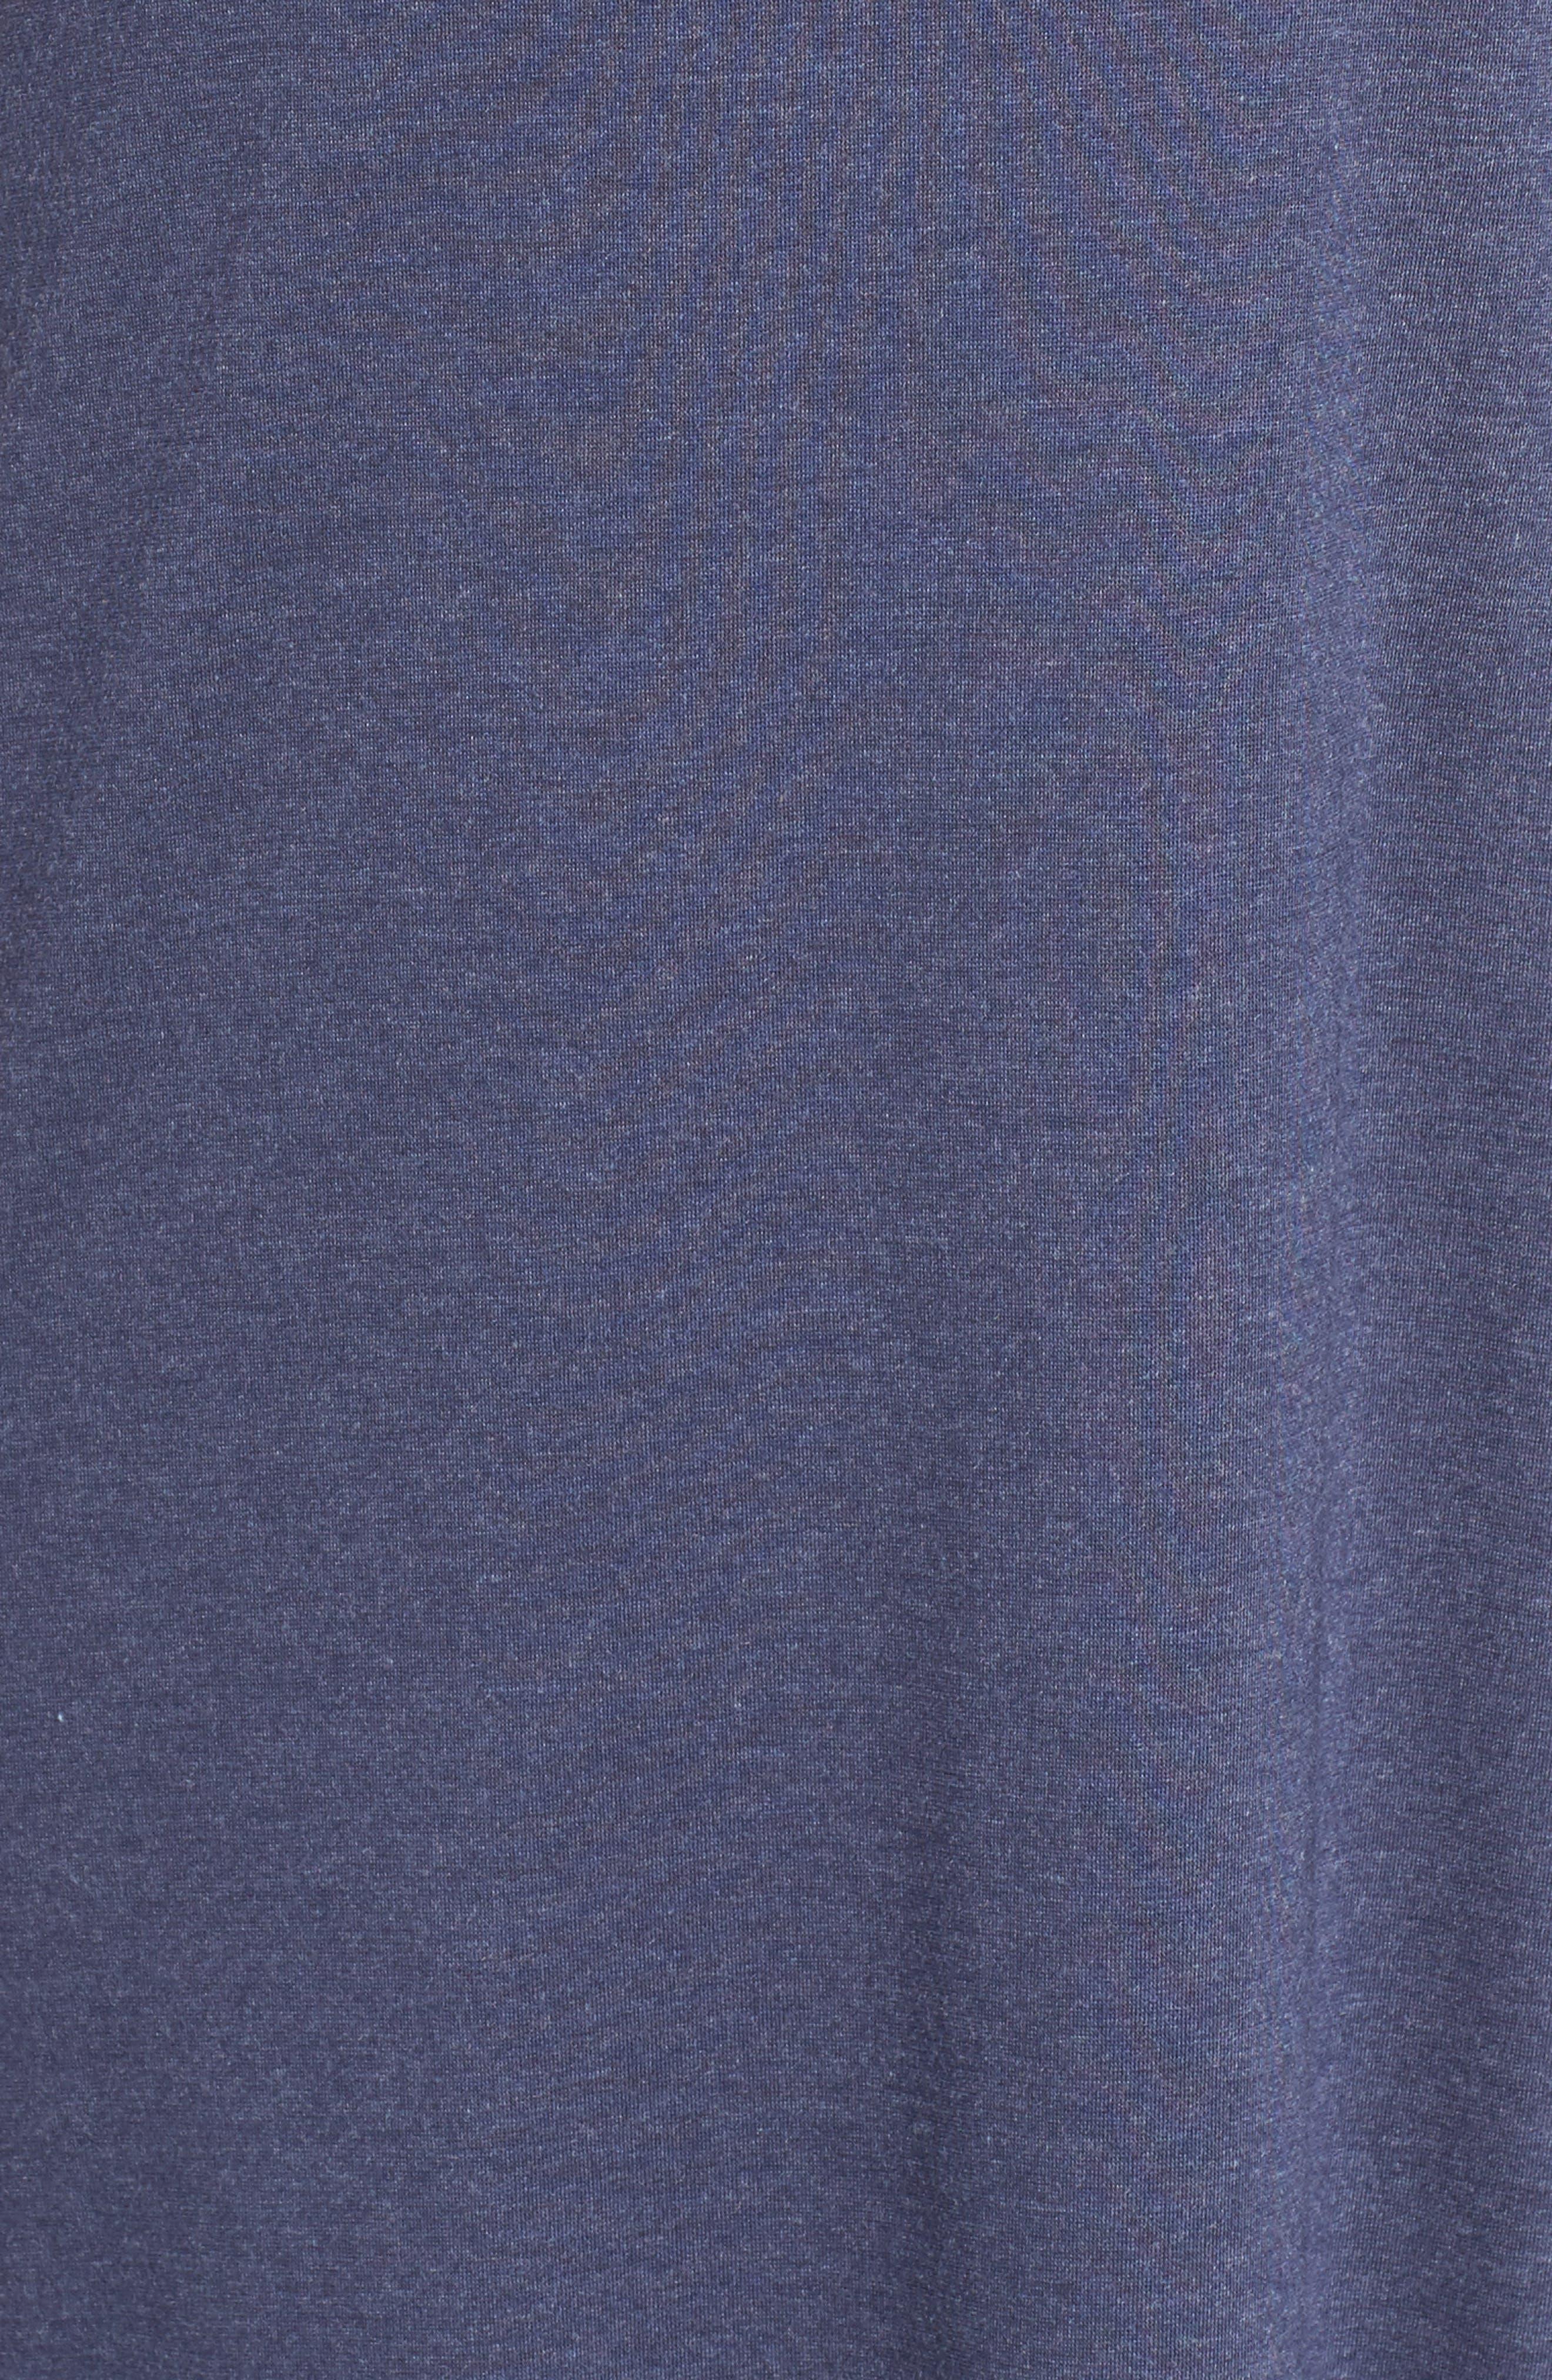 Shangri La Nightgown,                             Alternate thumbnail 5, color,                             HEATHER NIGHT BLUE